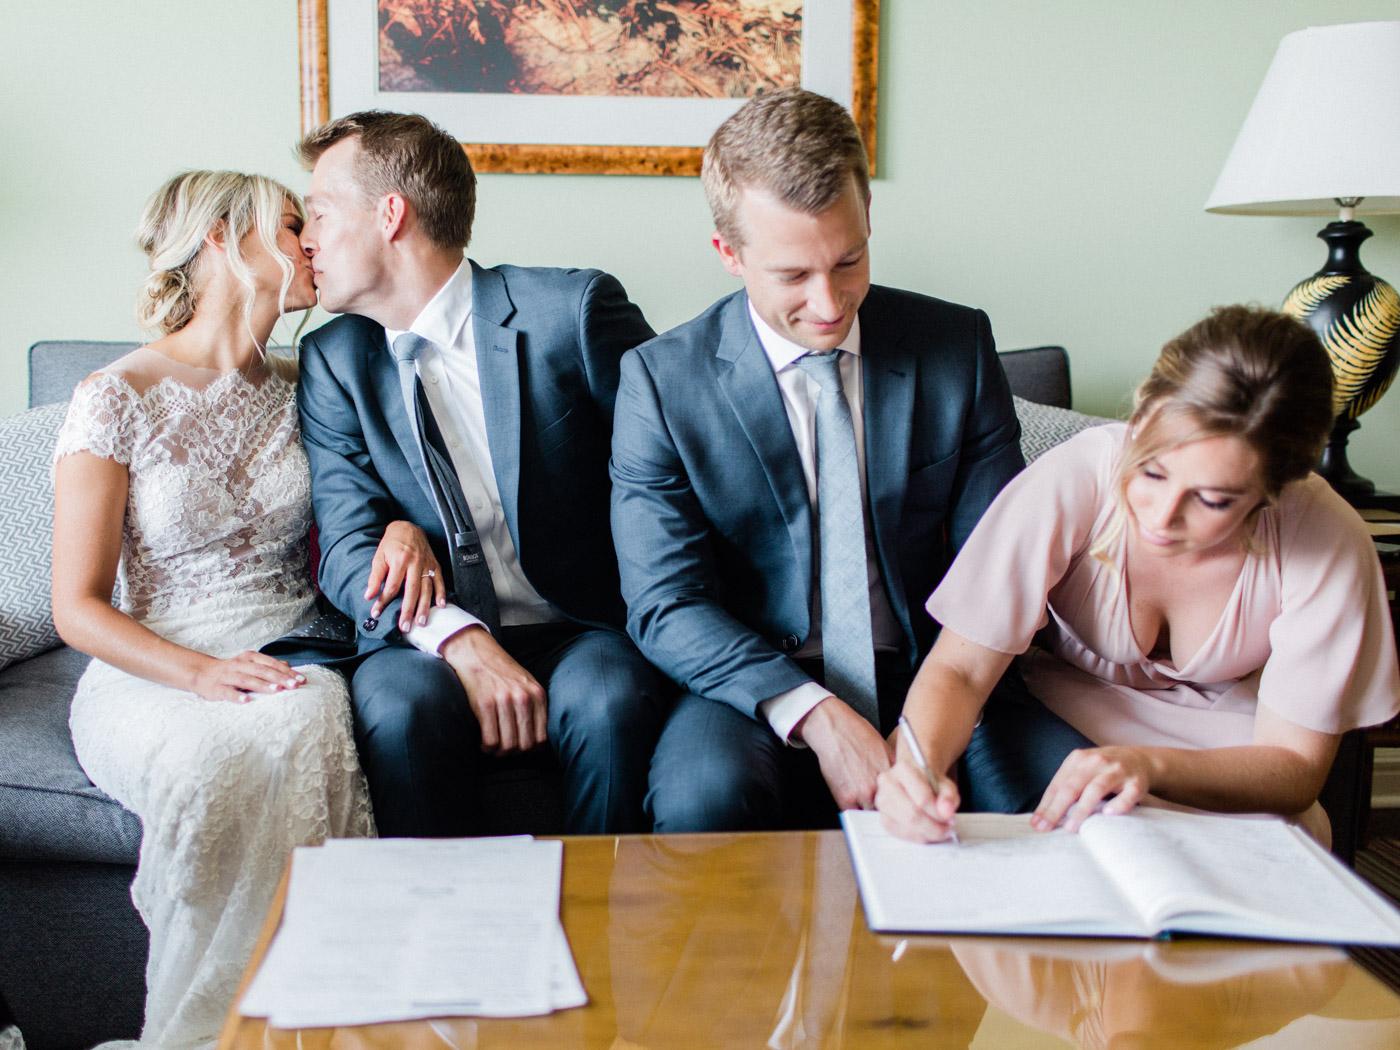 Toronto-Muskoka-wedding-photographer-summery-fun-documentary-the-marriott-rosseau57.jpg